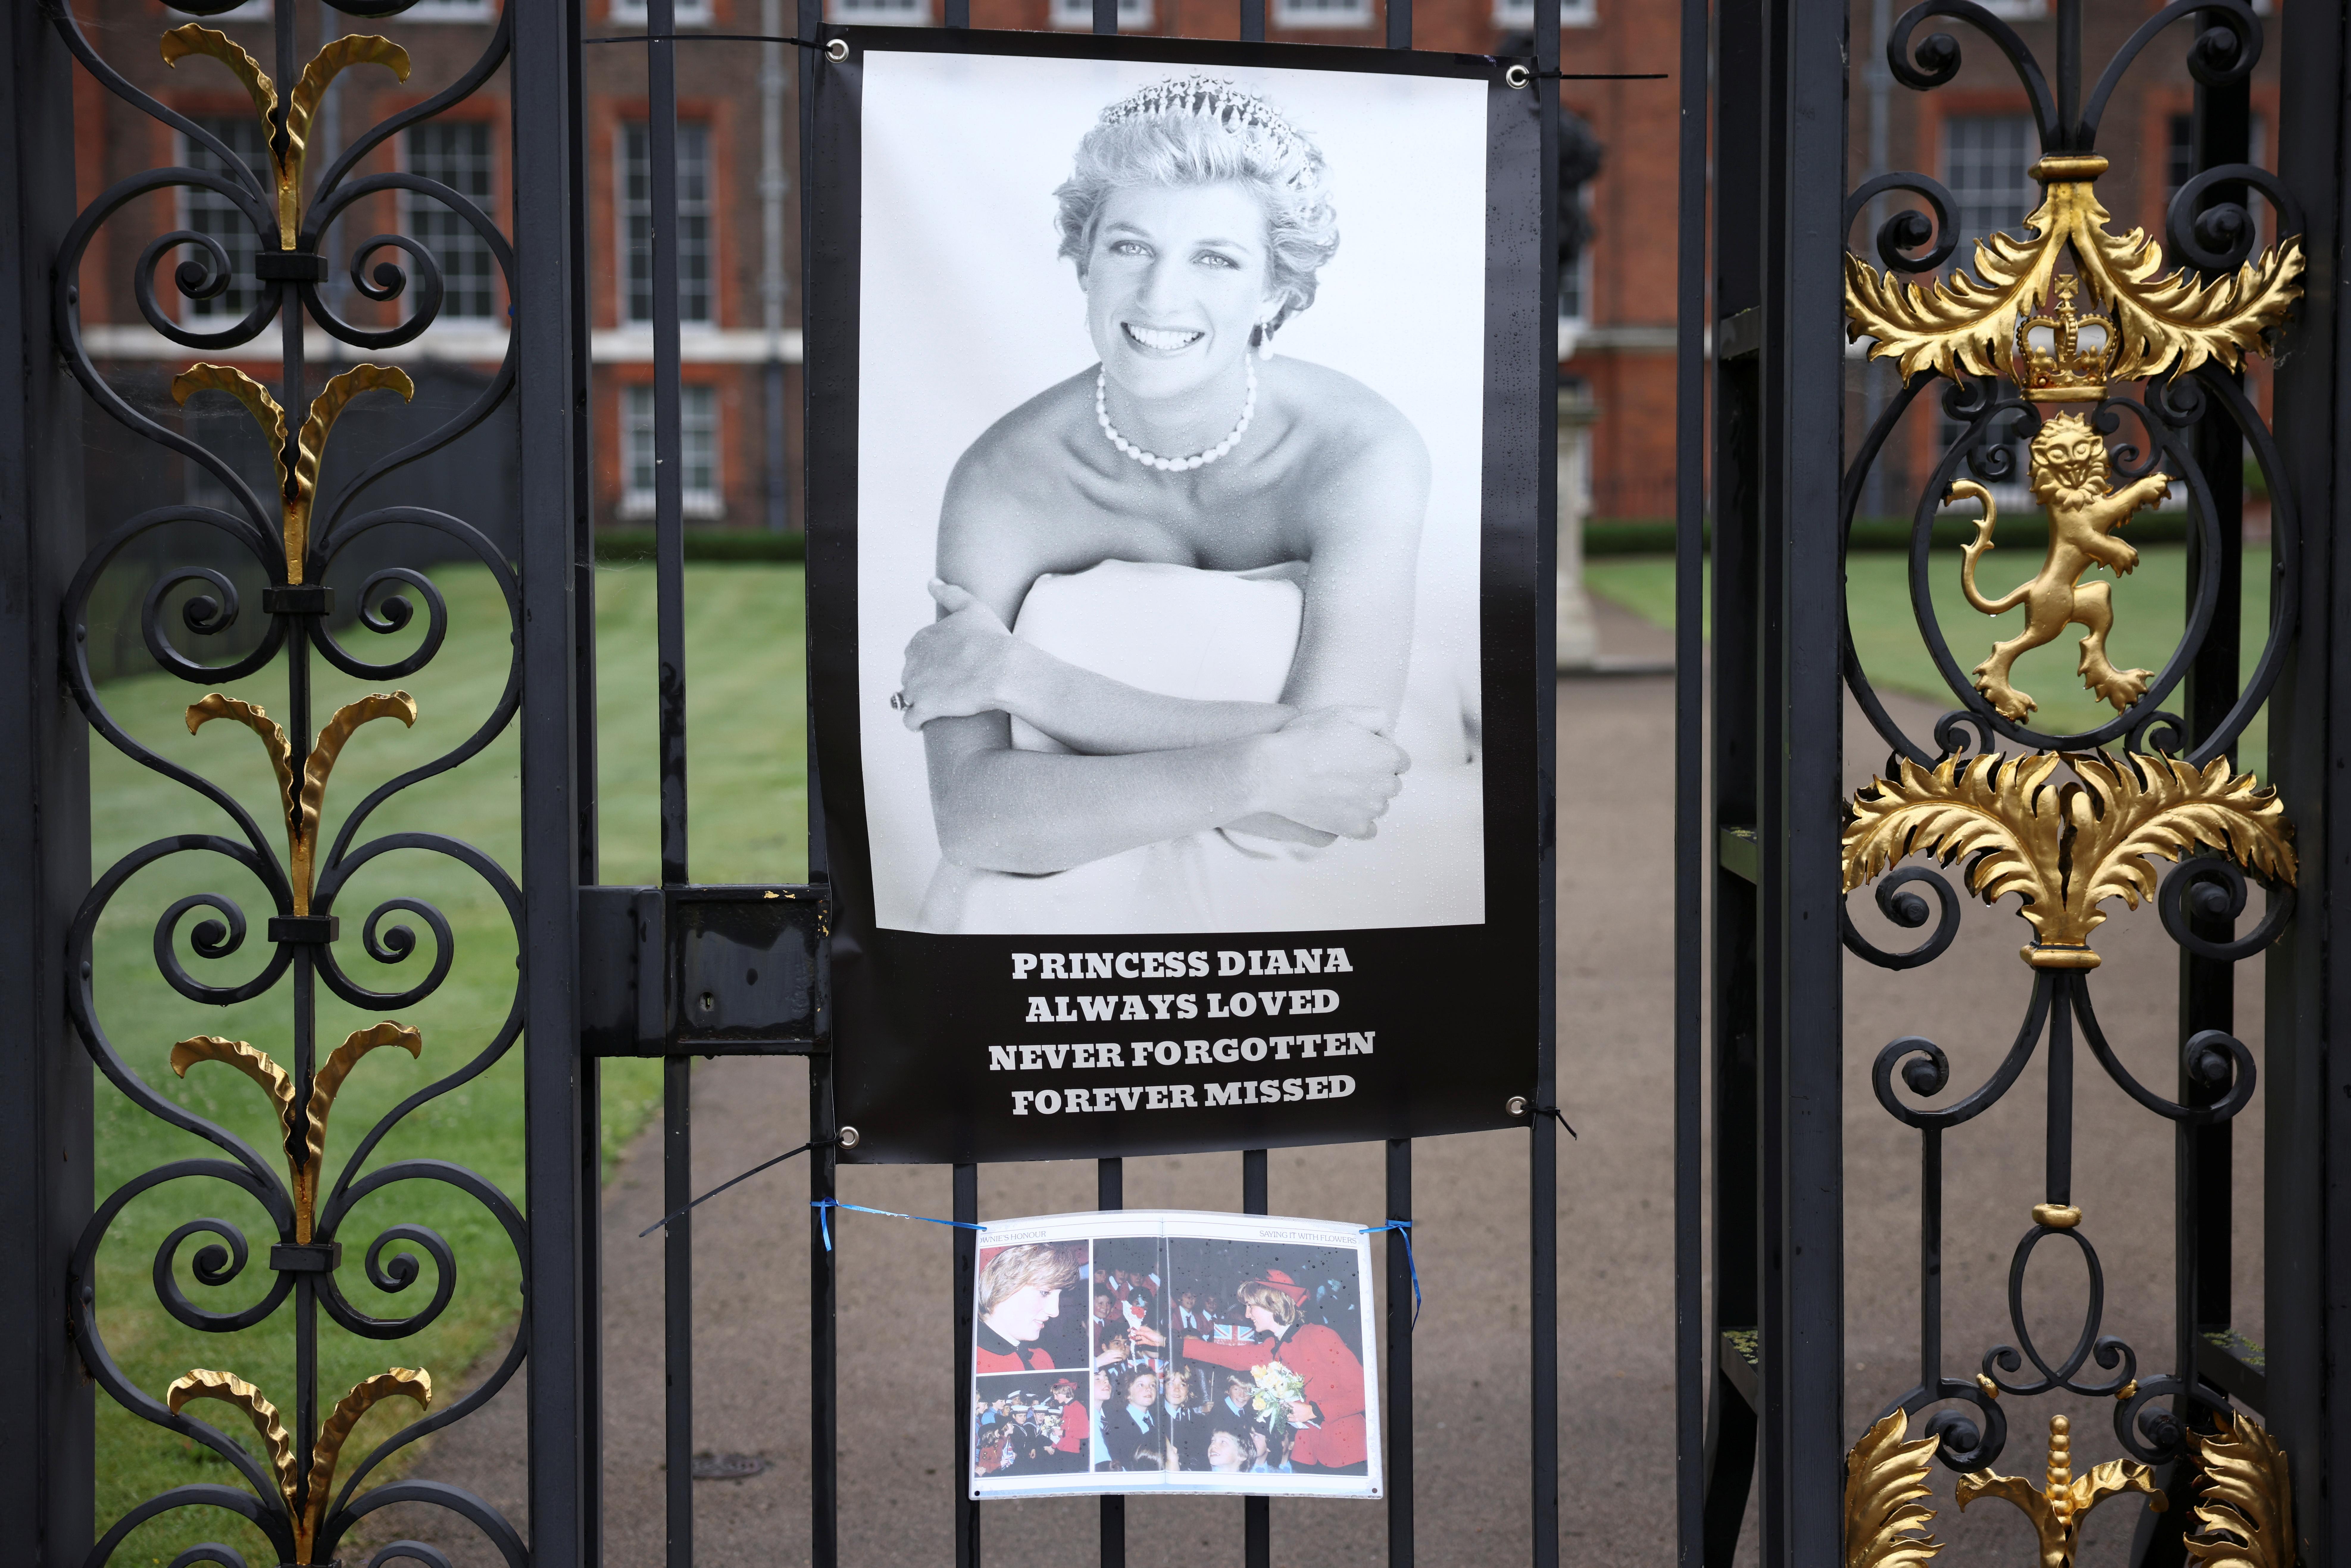 Tributes for Britain's Princess Diana hang outside Kensington Palace in London, Britain June 28, 2021. REUTERS/Henry Nicholls